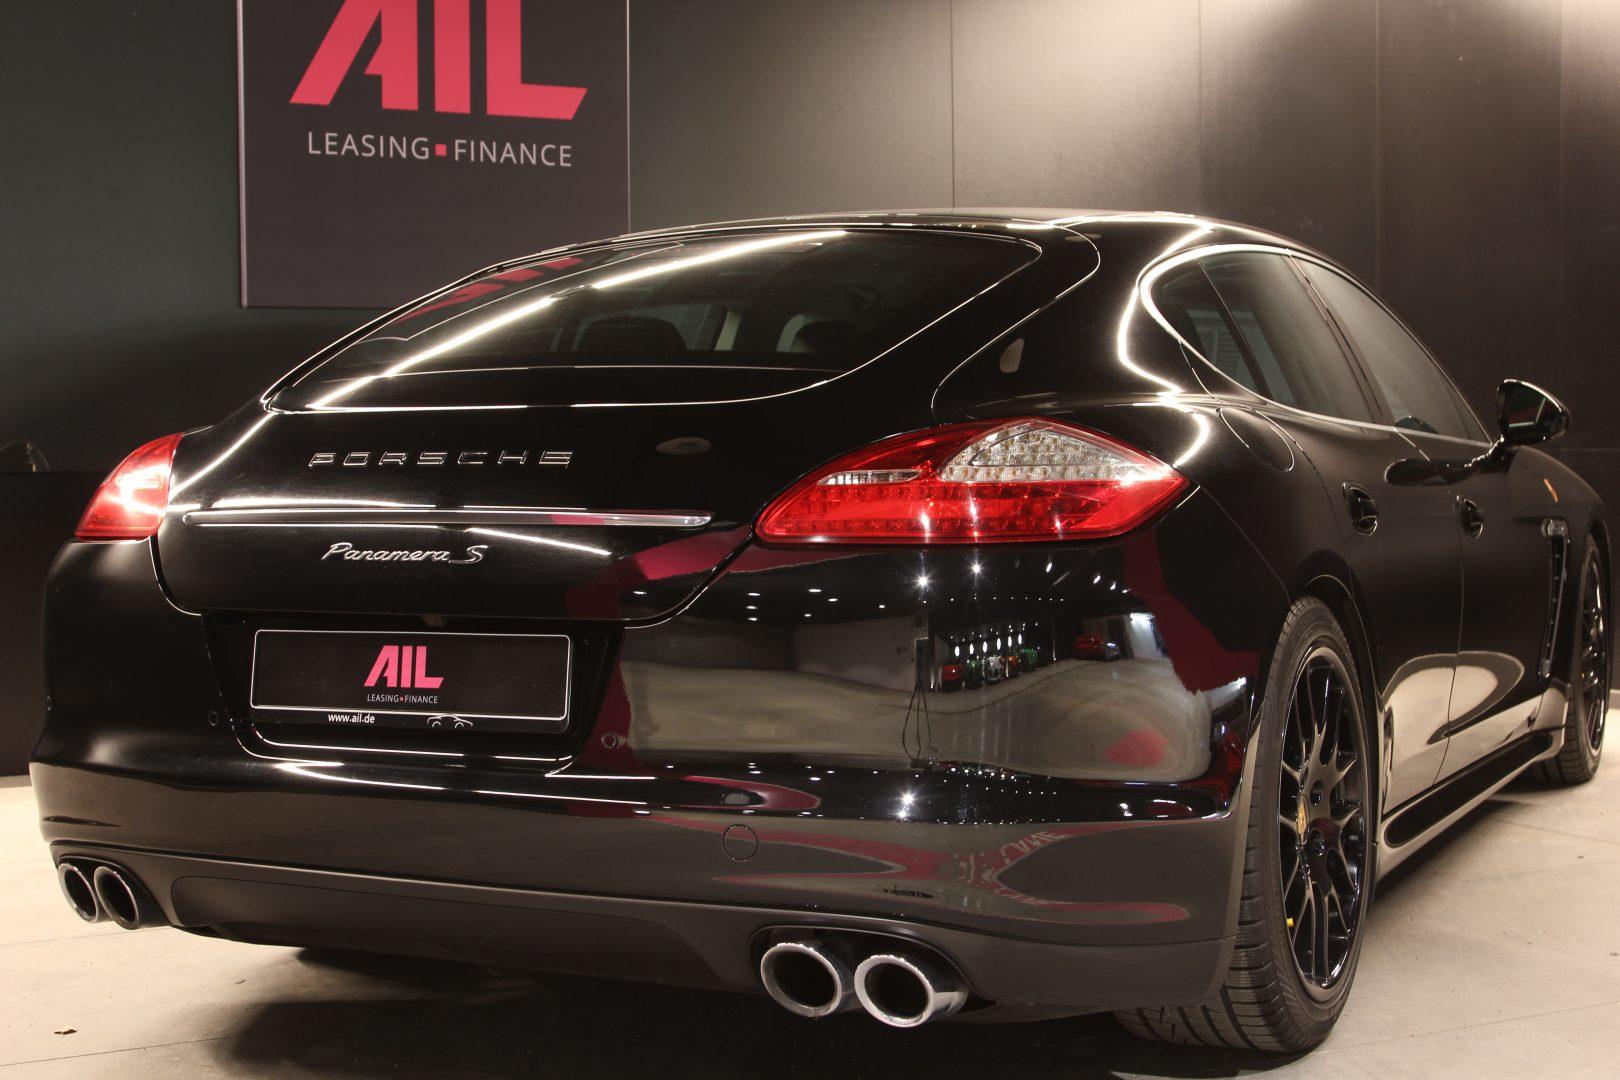 AIL Porsche Panamera S  3